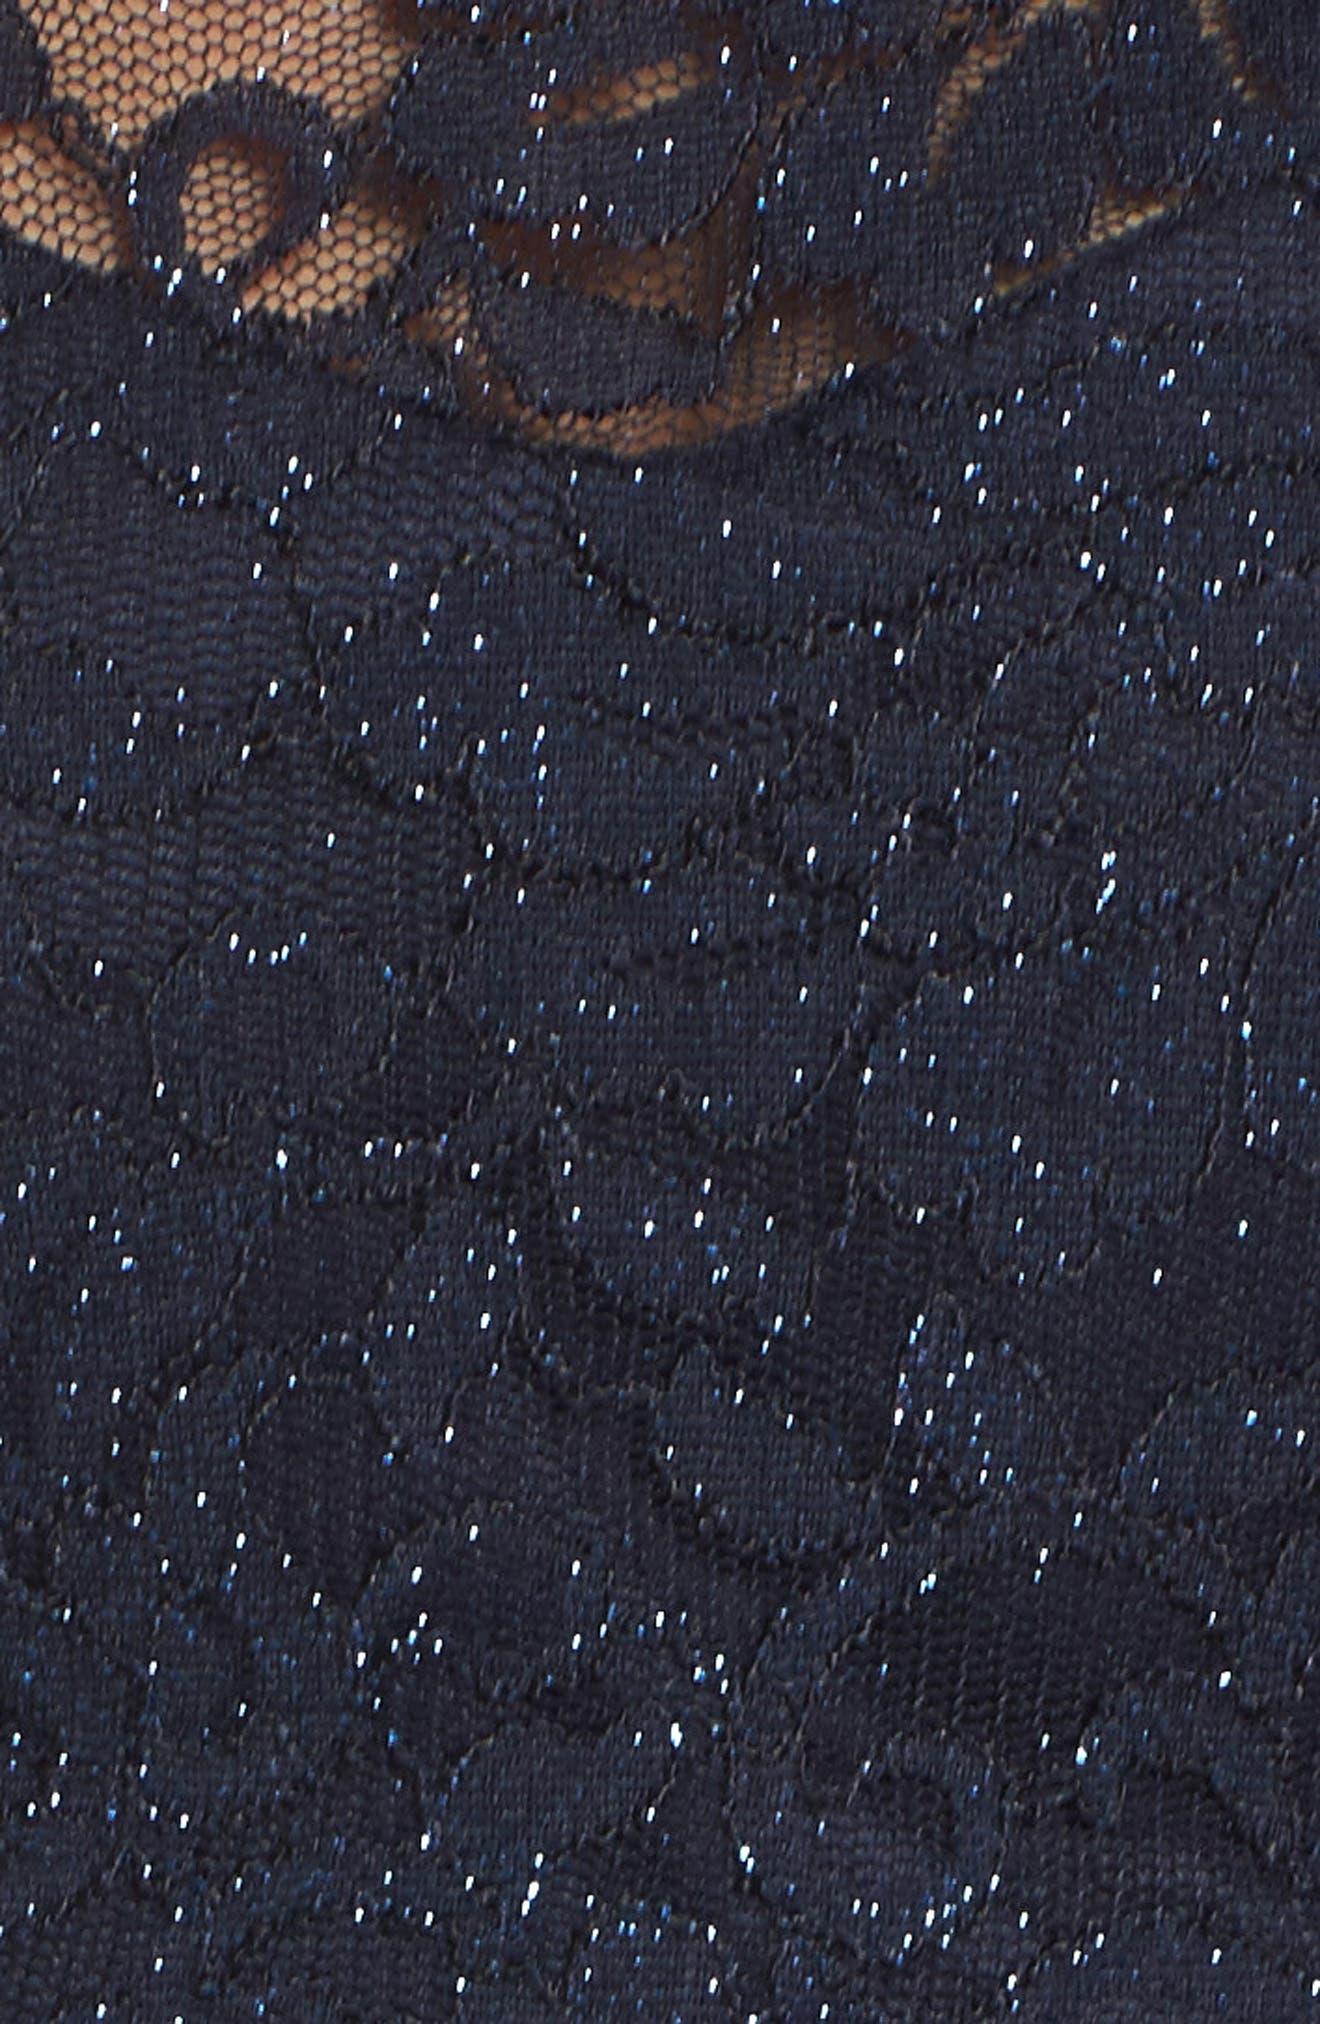 Floral & Lace Two-Piece Gown,                             Alternate thumbnail 5, color,                             410